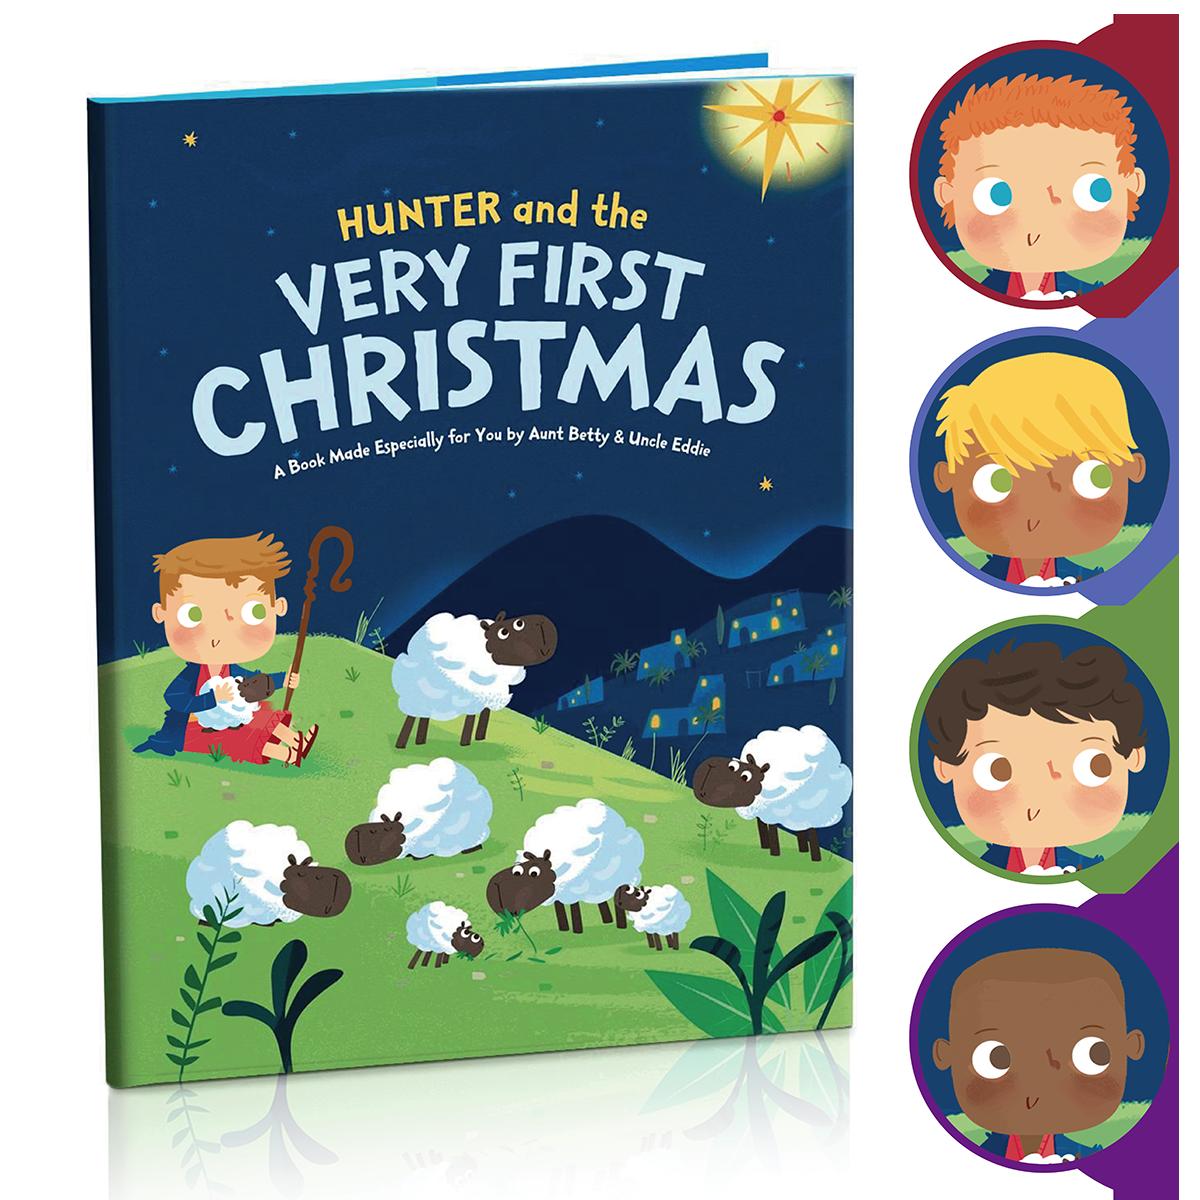 Amazon.com: Hallmark Personalized Books: Very First ...